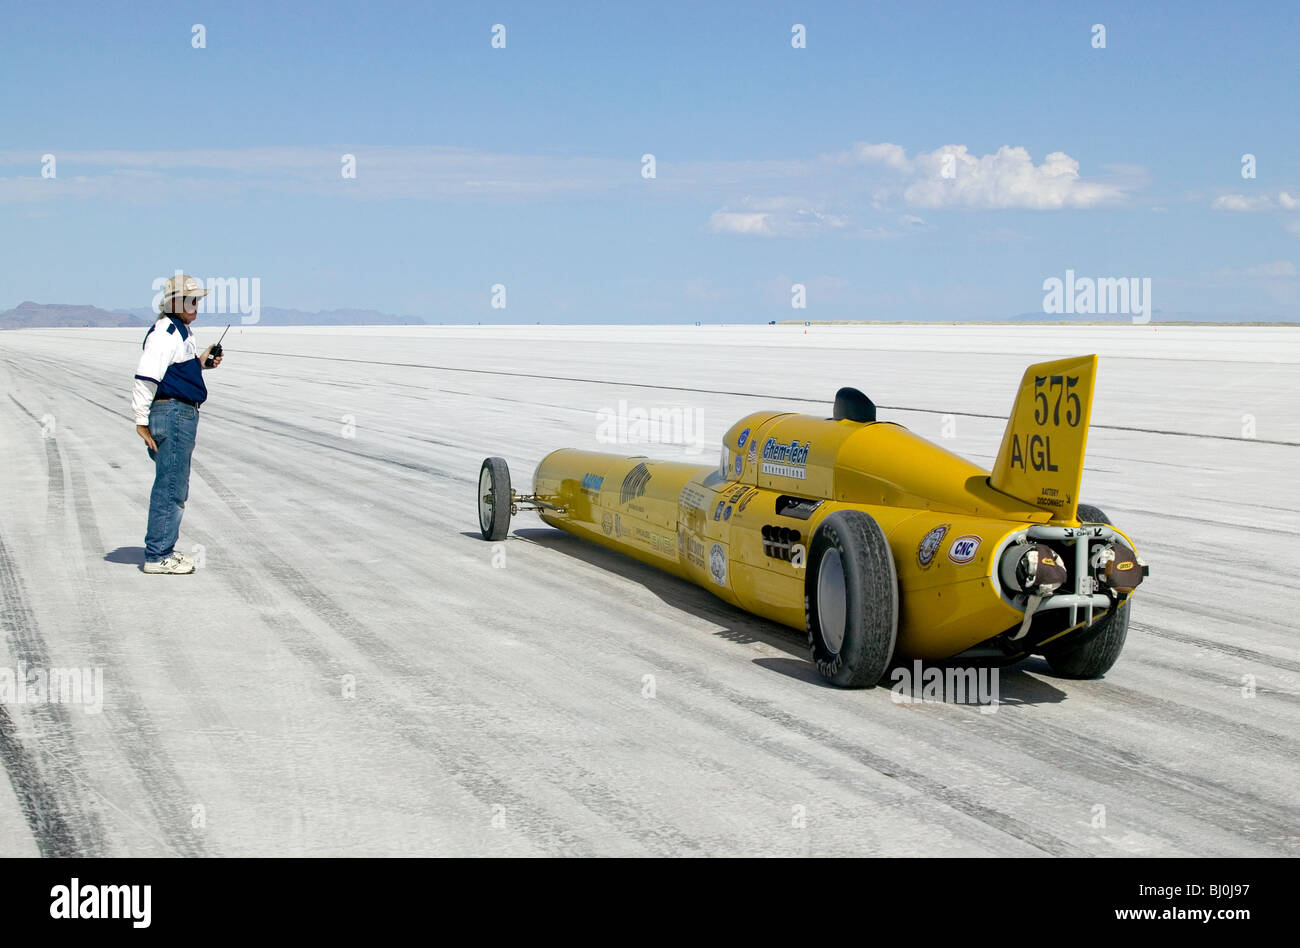 Bonneville speed record car at the start of record attempt. Bonneville speedway Utah USA Stock Photo